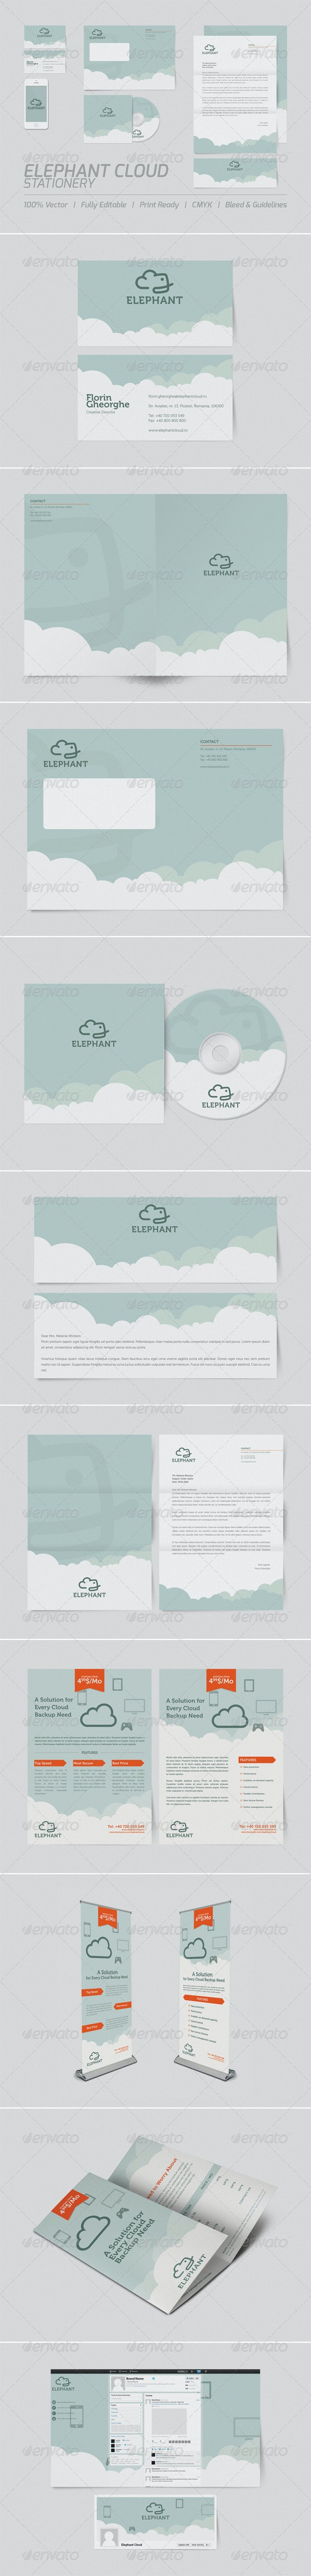 Elephant Cloud Stationery - Stationery Print Templates